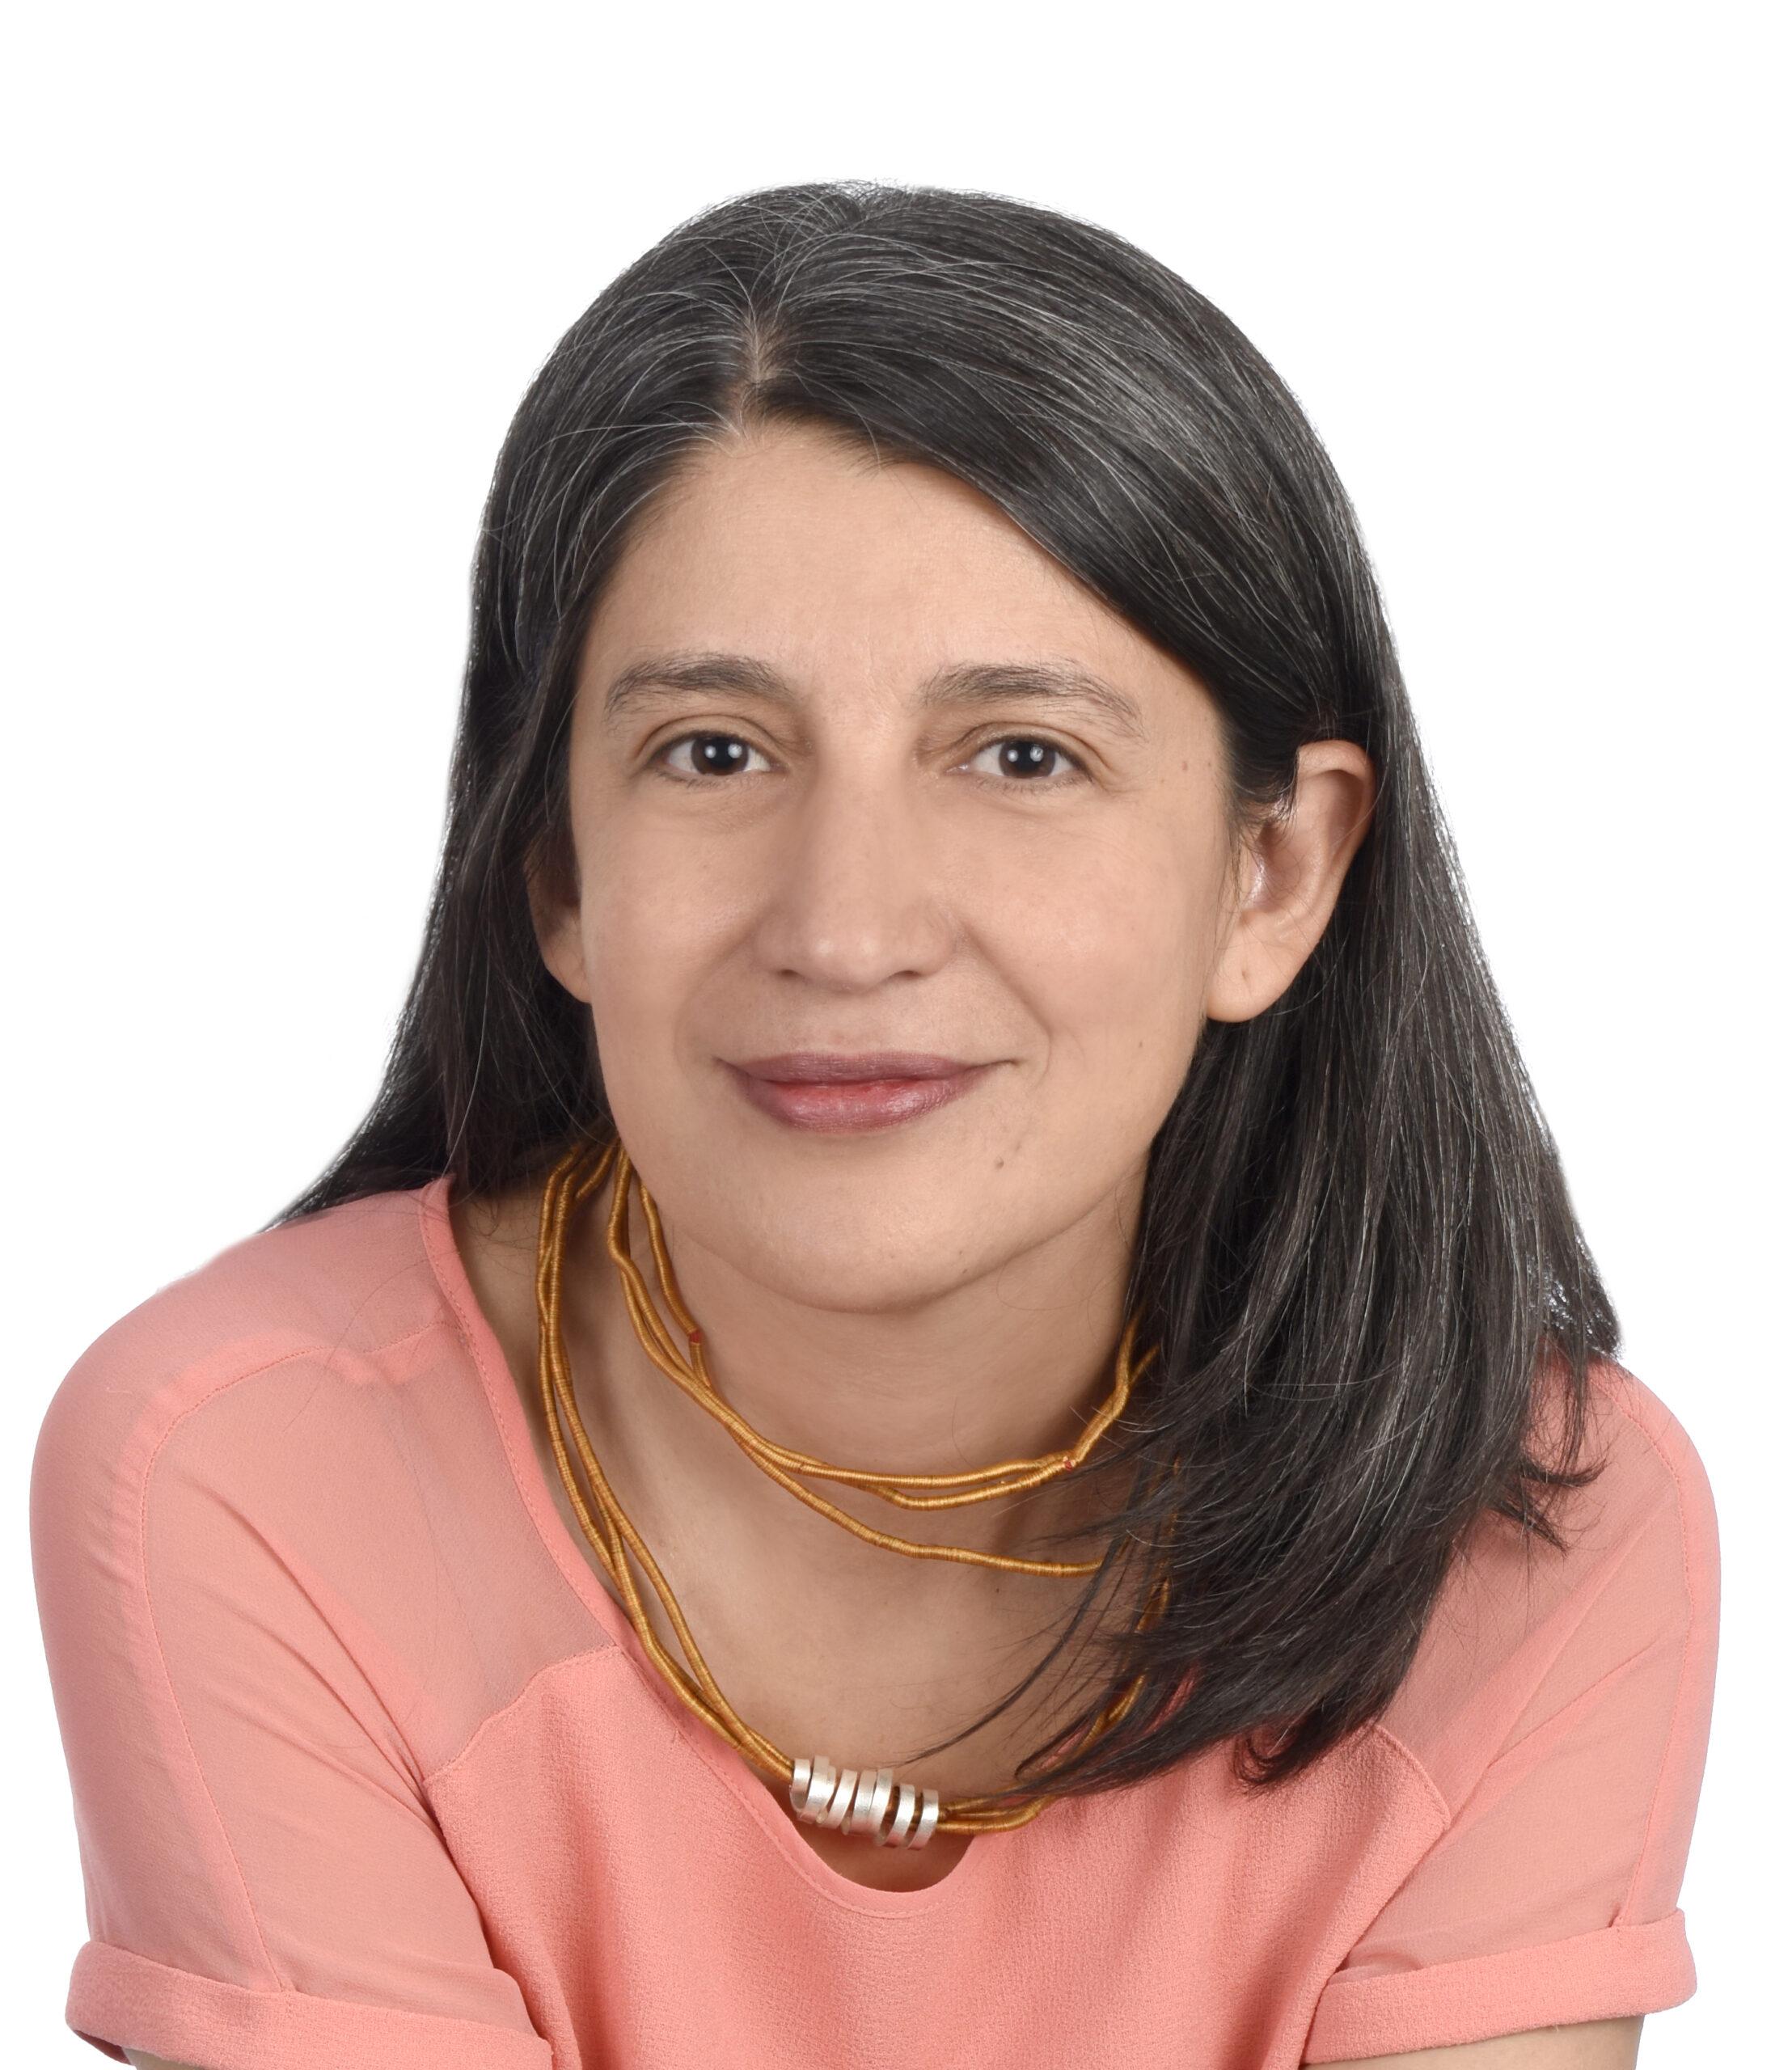 Ana Maria MORENO BALLESTEROS